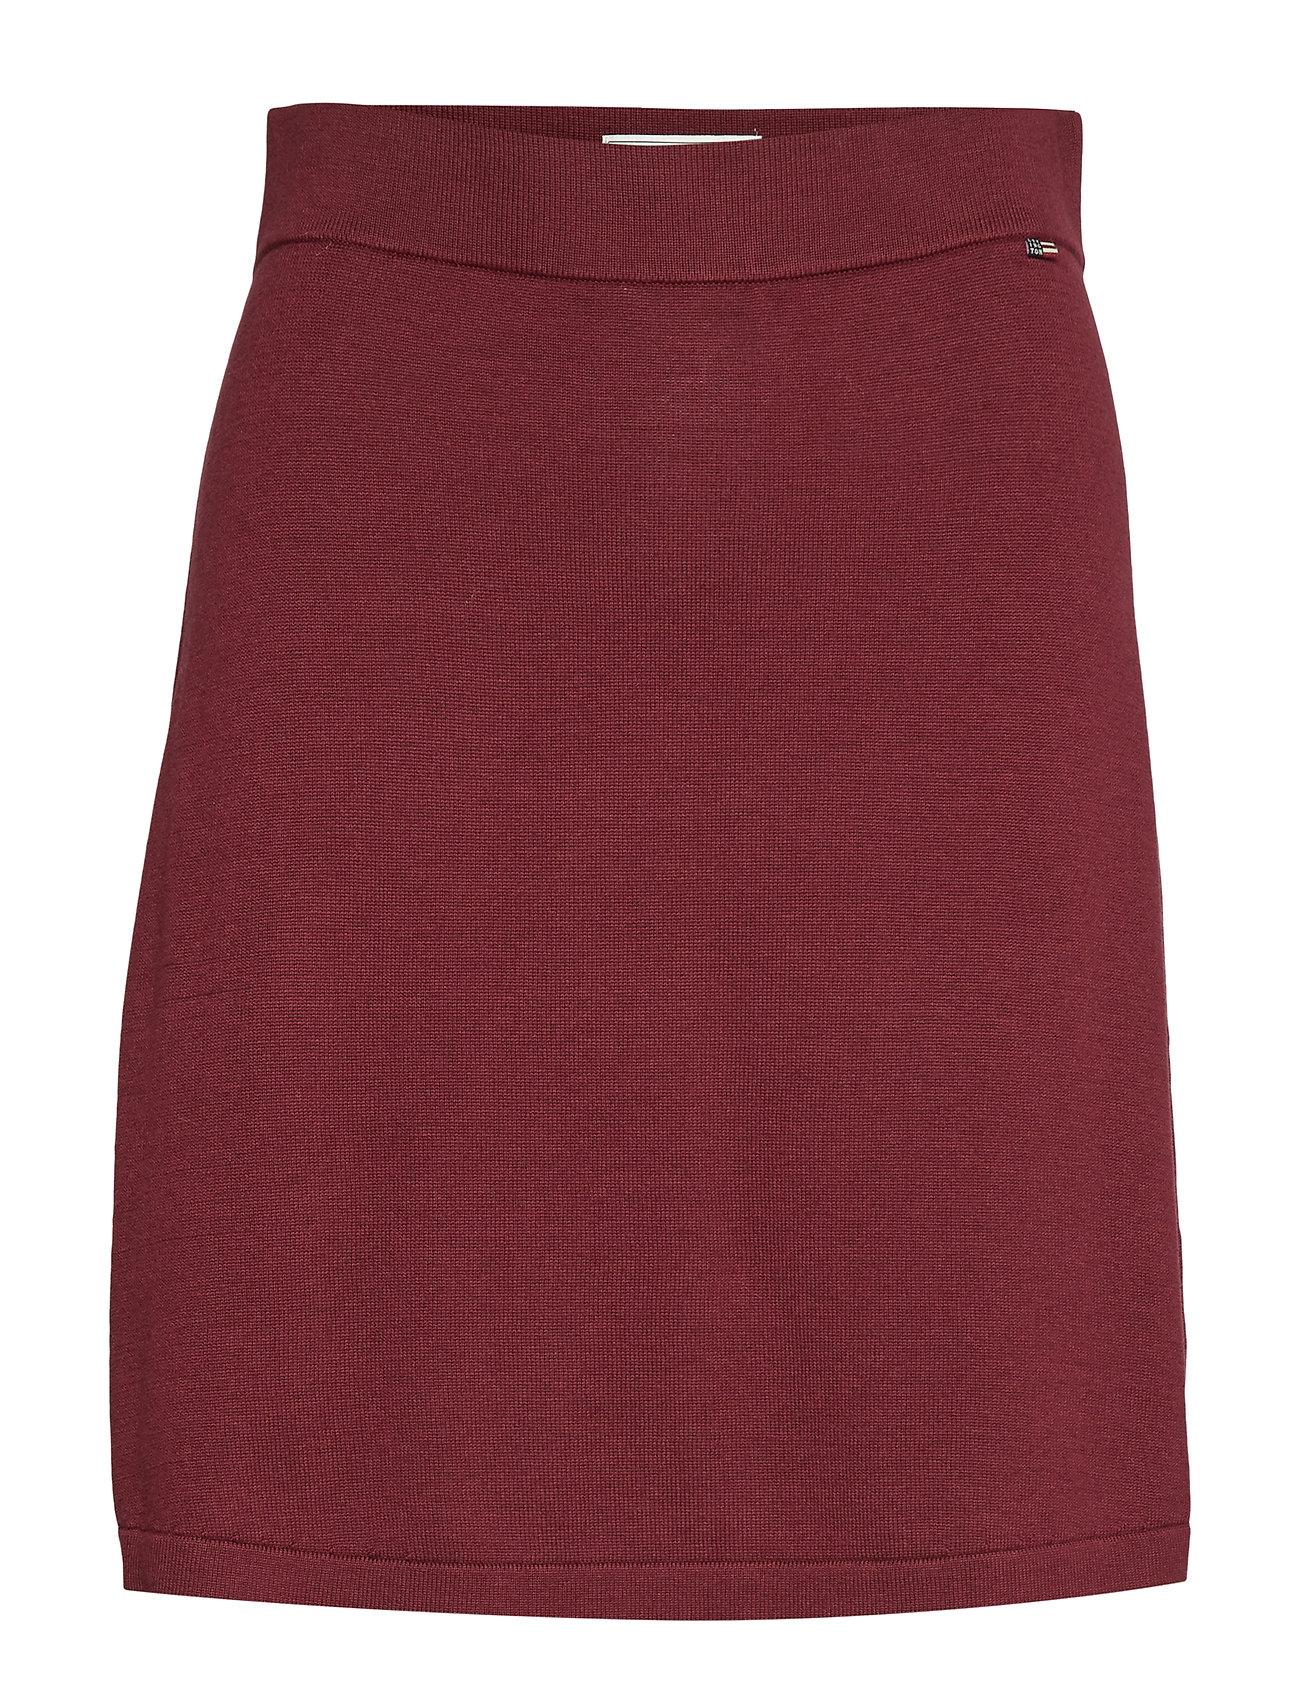 Lexington Clothing Chastity Knitted Skirt - DARK RED